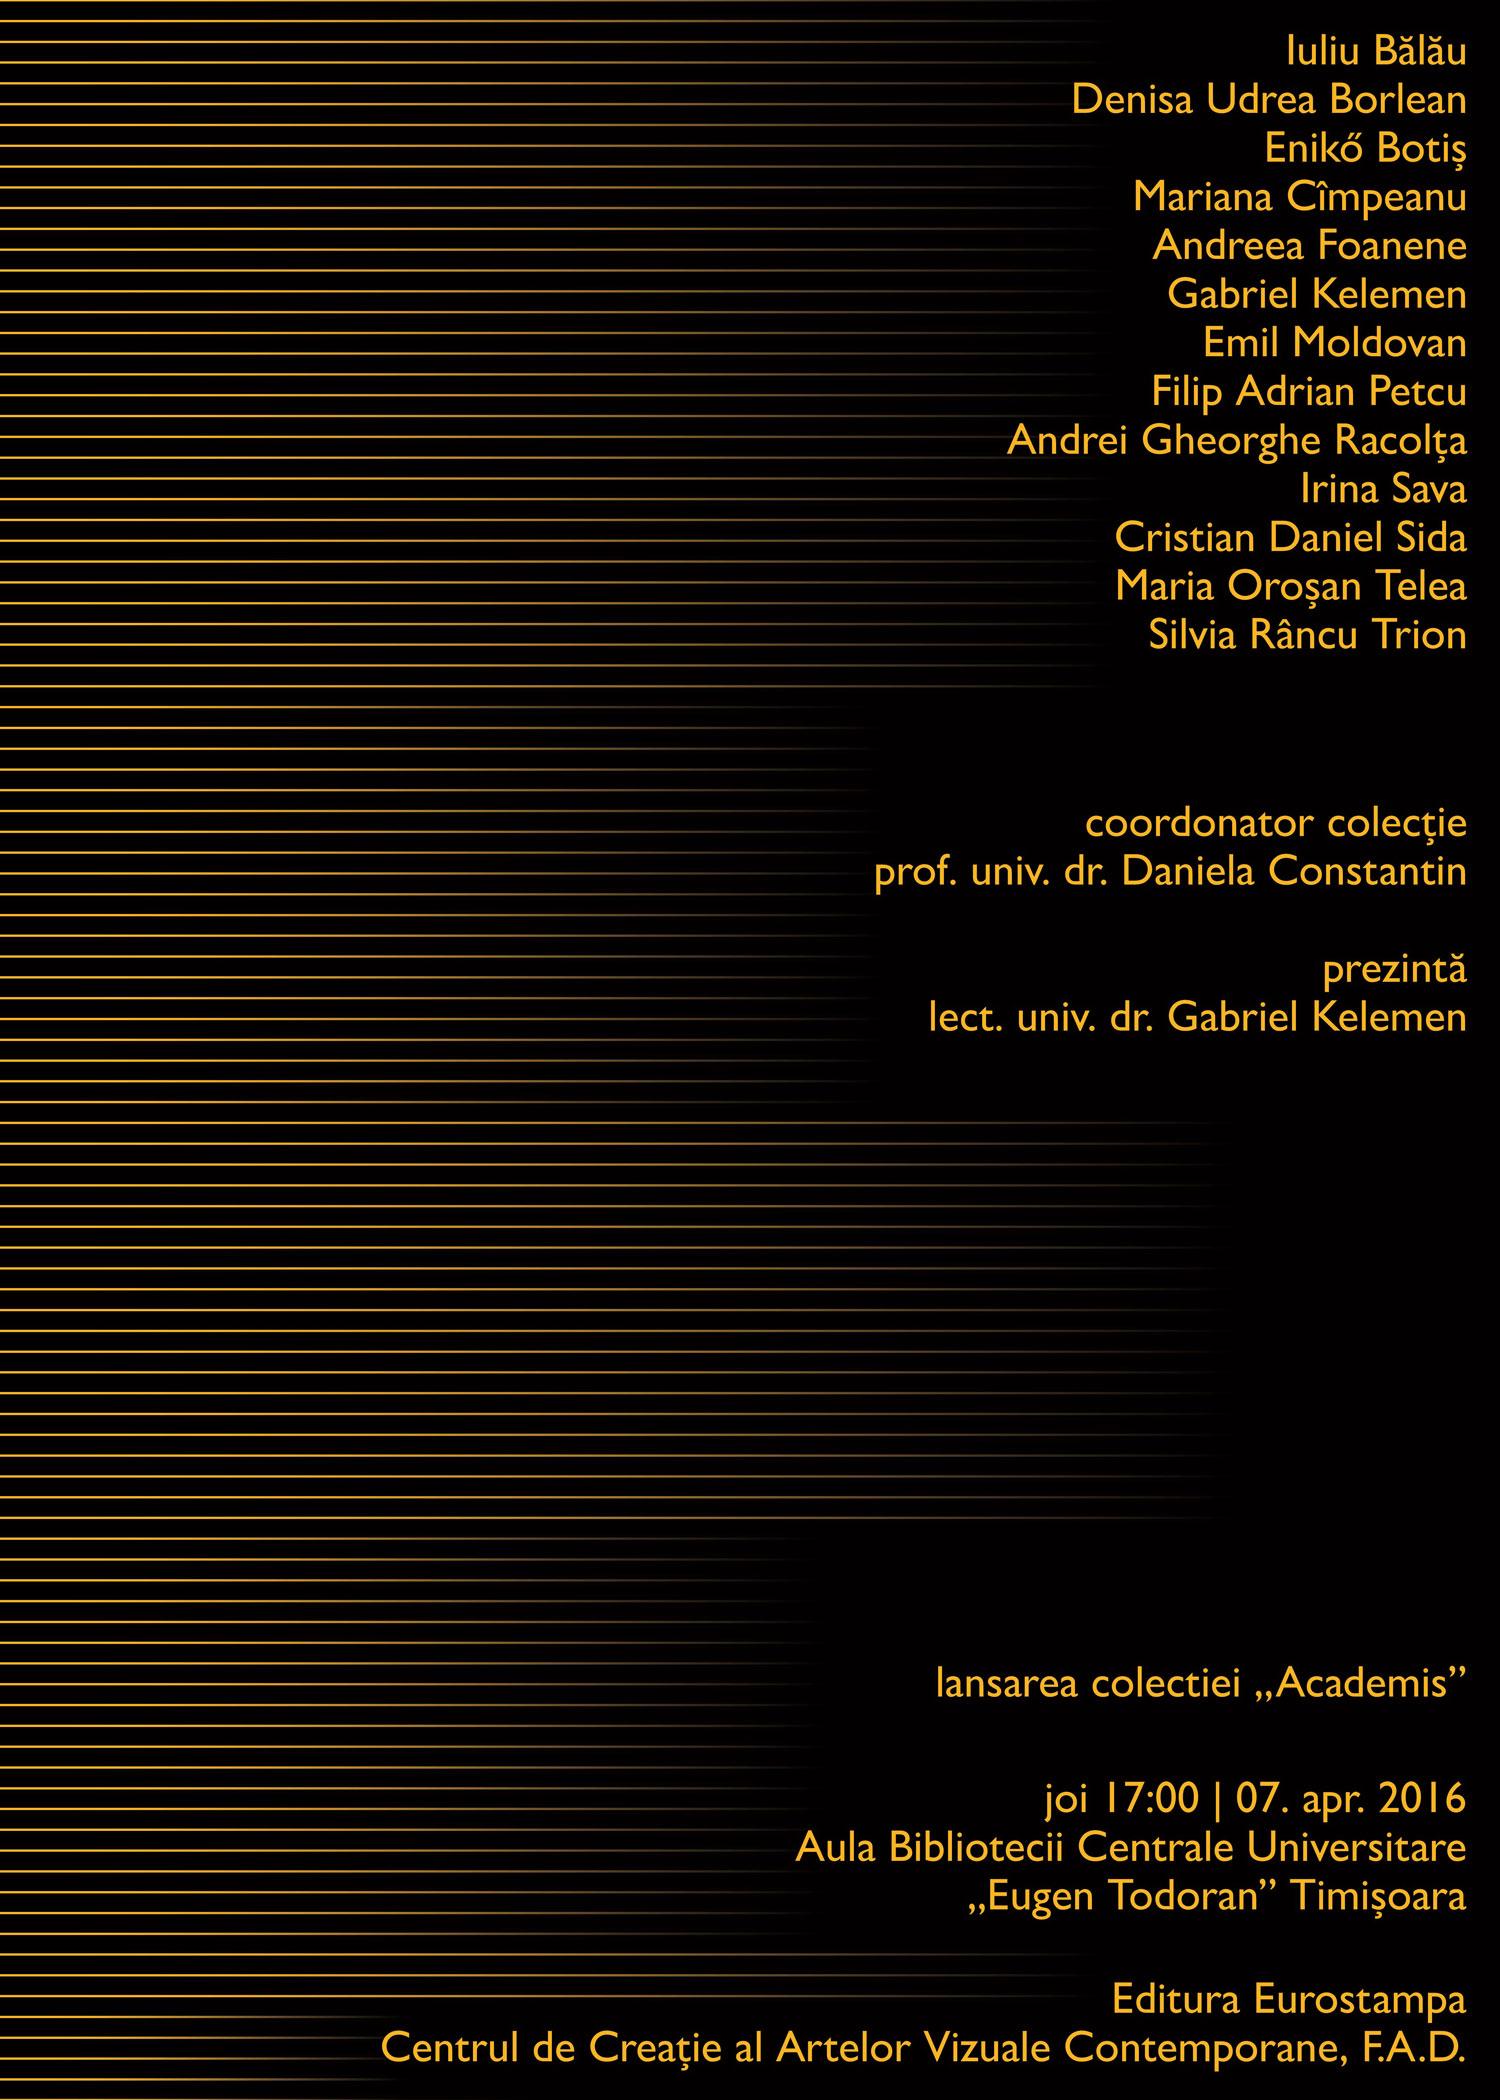 Afis-Colectie-Academis-page-001-(1)